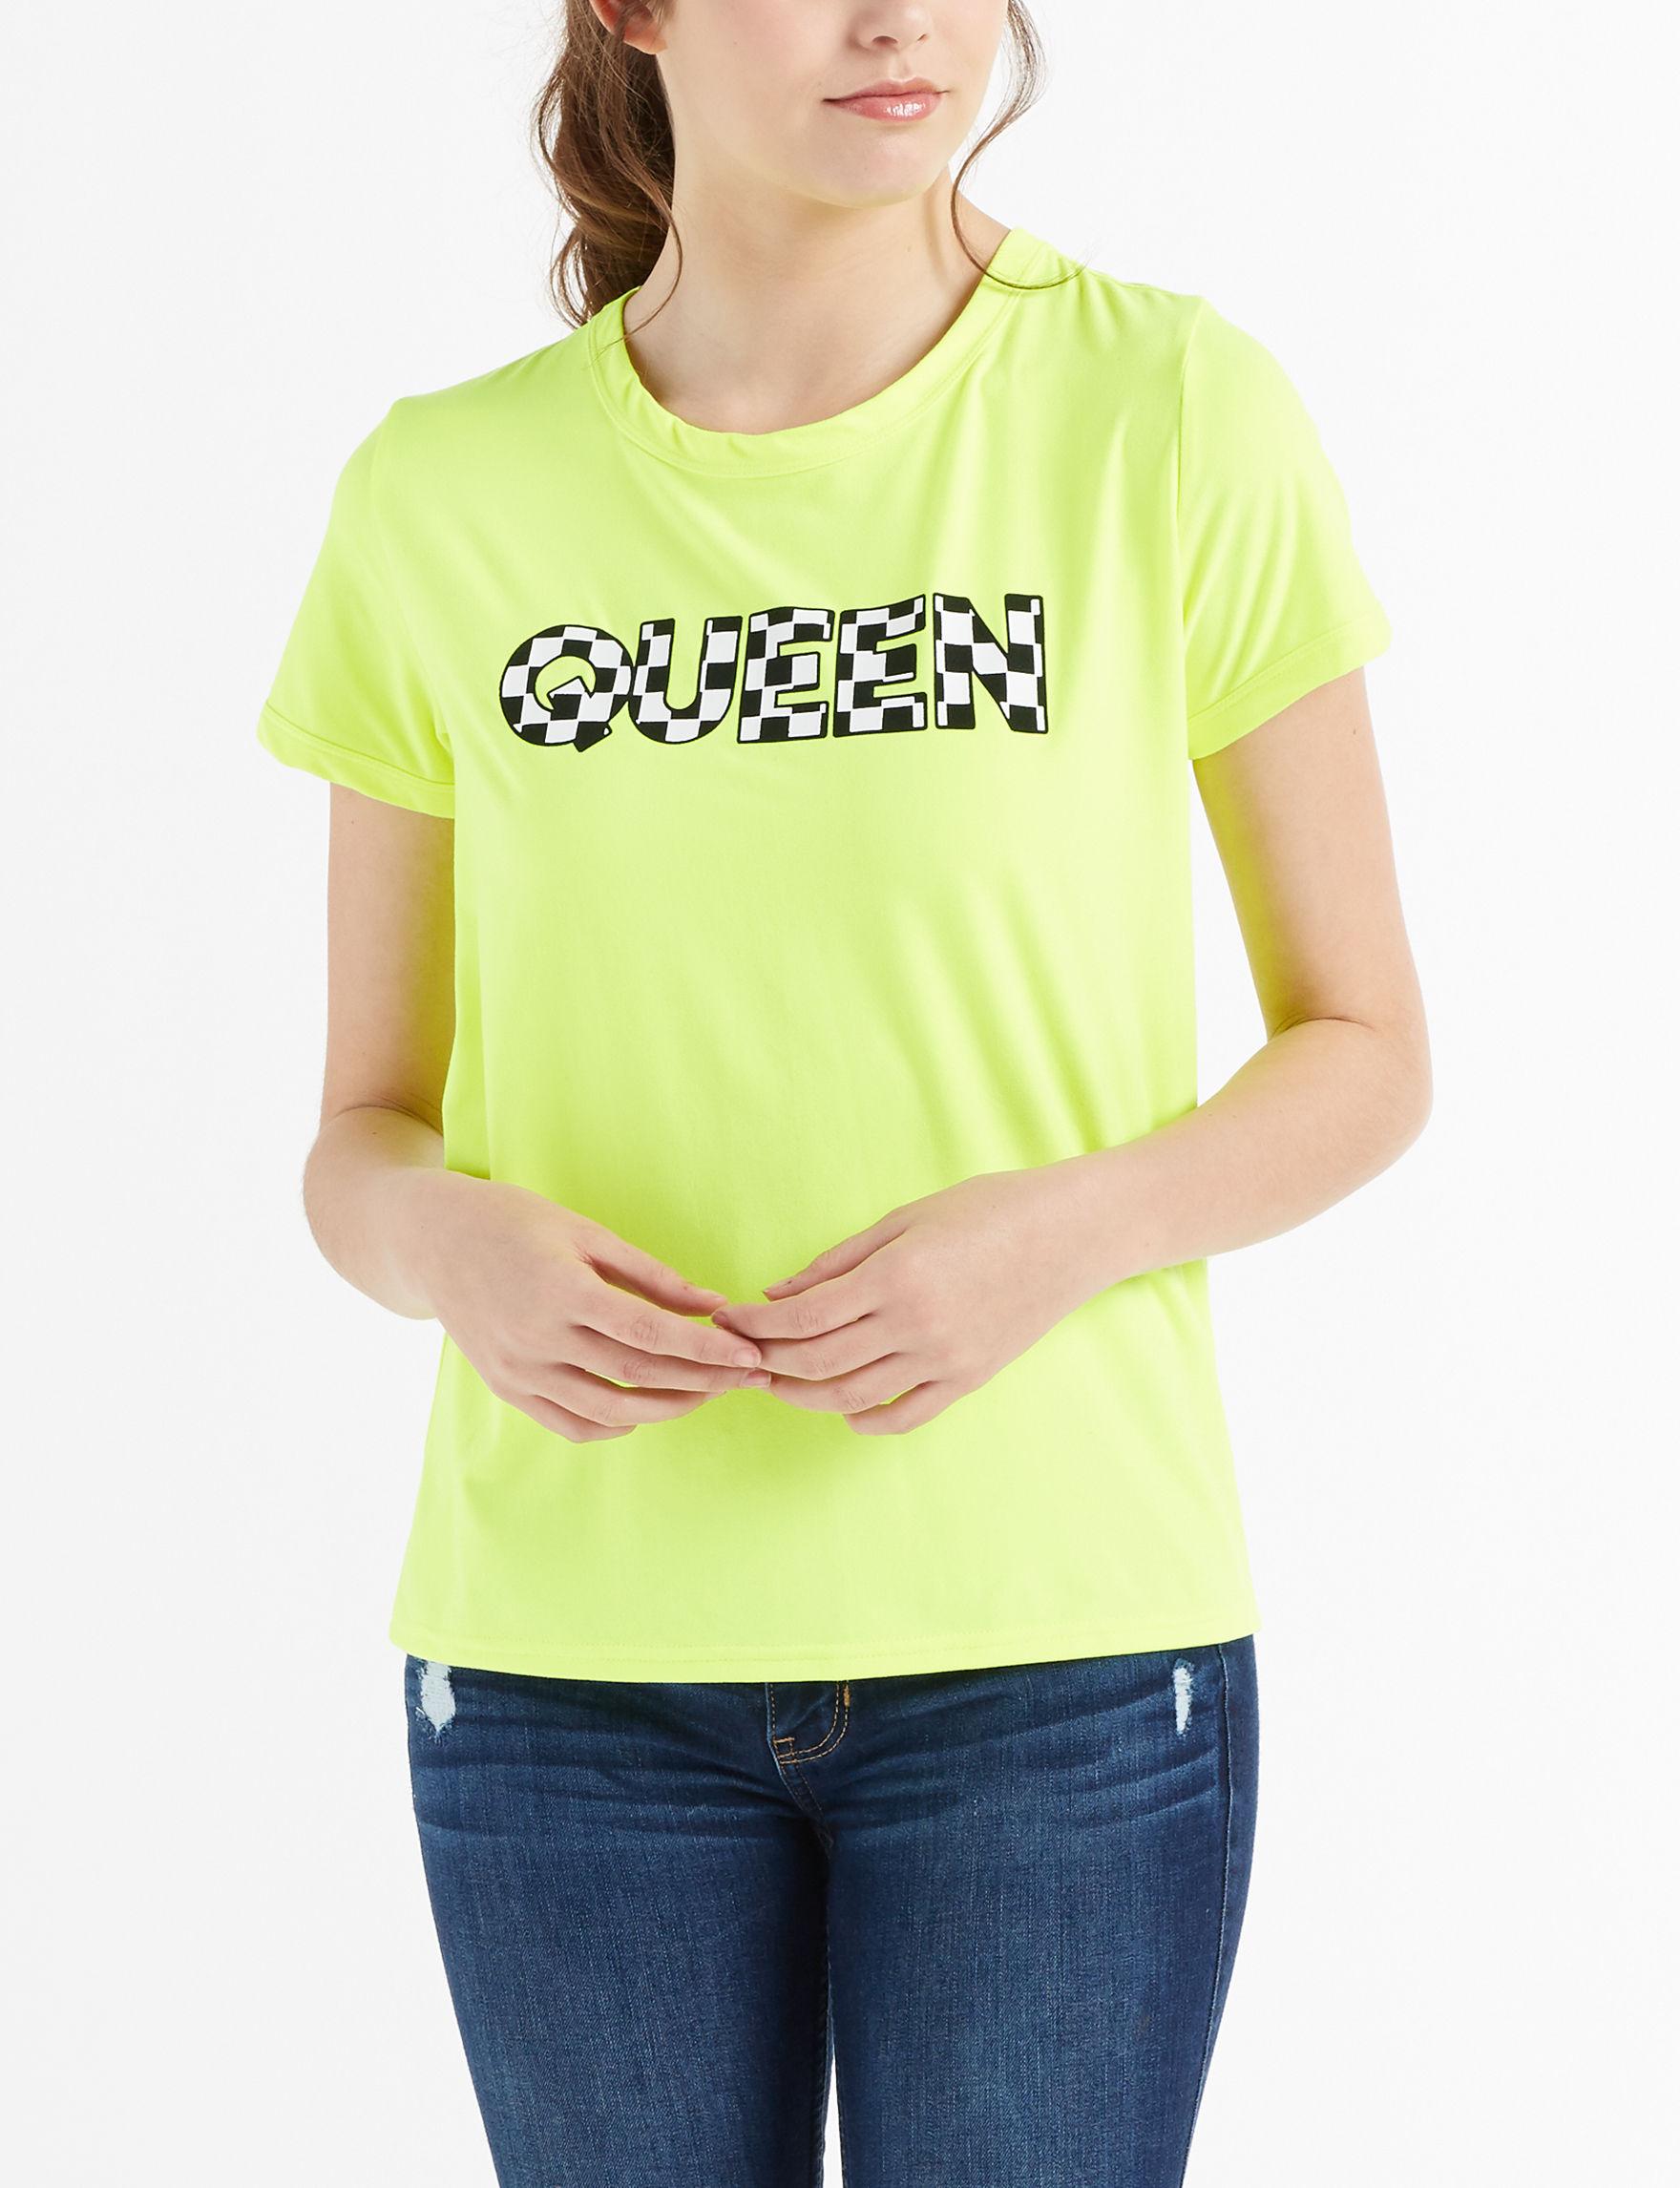 Justify Neon Yellow Tees & Tanks